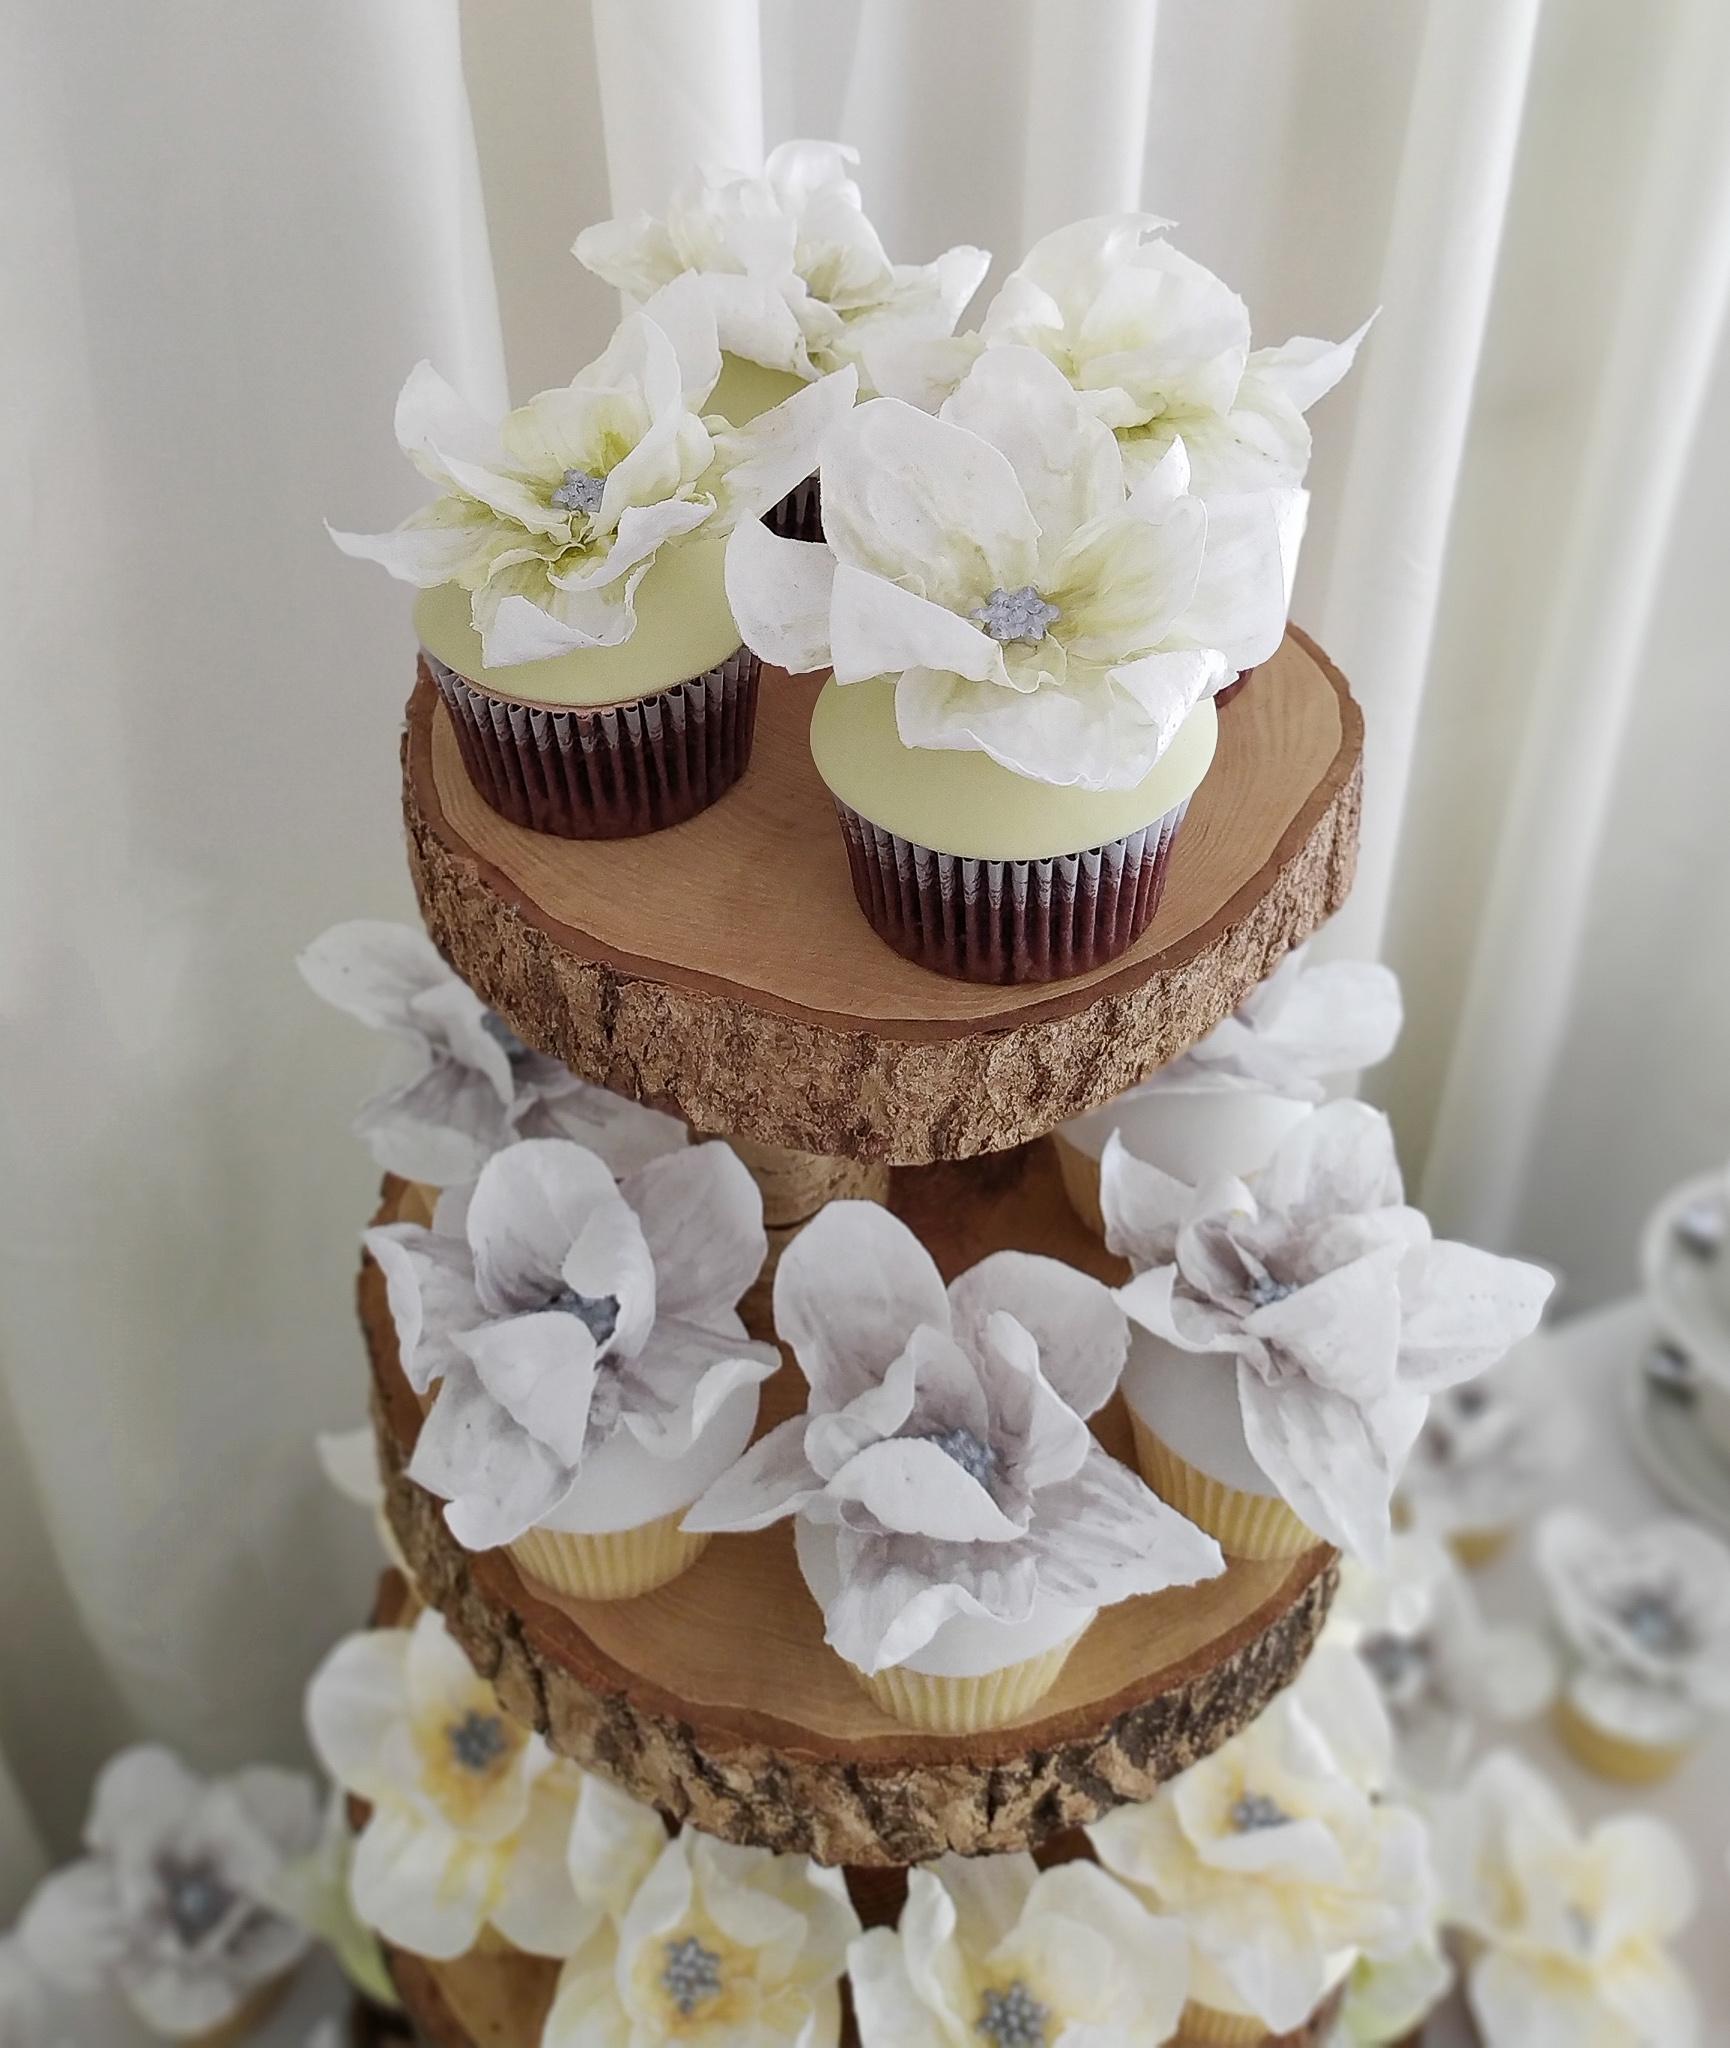 Wafer paper flower green wedding cupcakes.jpg